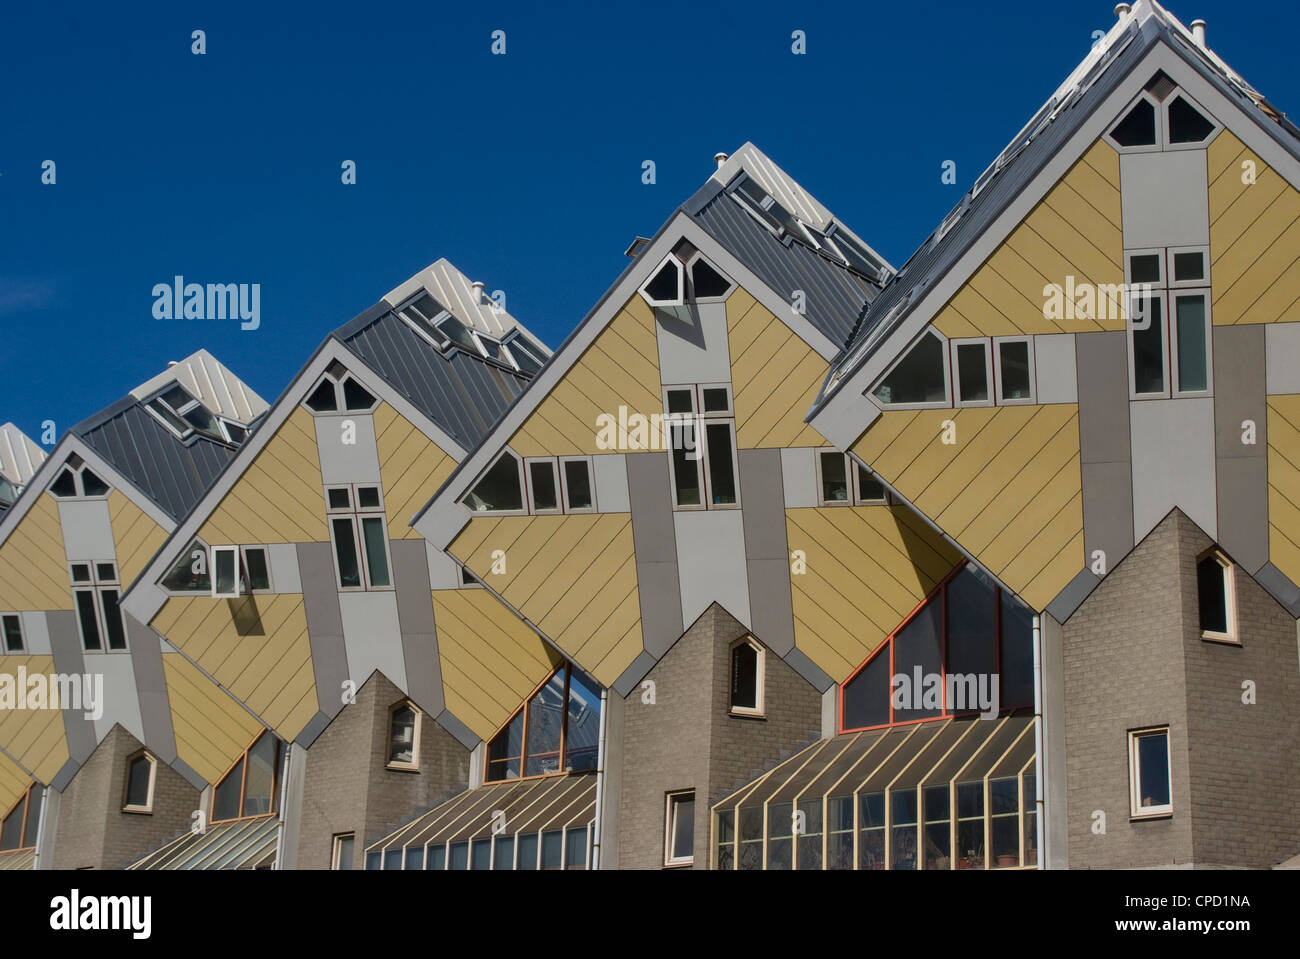 Casa Cúbicas (Kubuswoningen), diseñado por Piet Blom, Rotterdam, Países Bajos, Europa Imagen De Stock